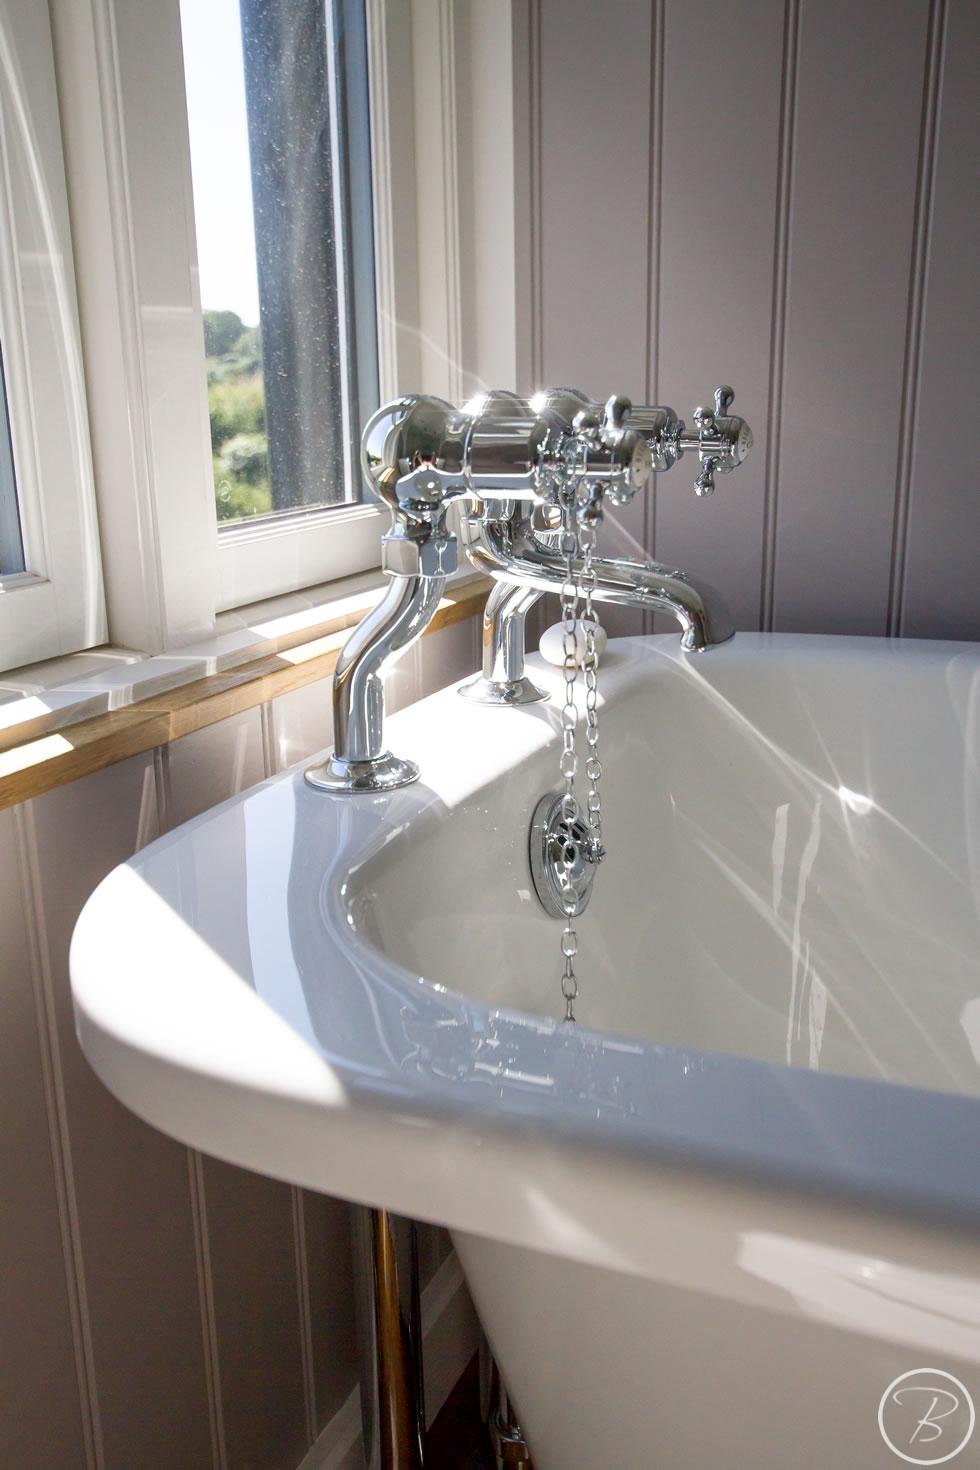 Holywell-Row-Bathroom-1-10